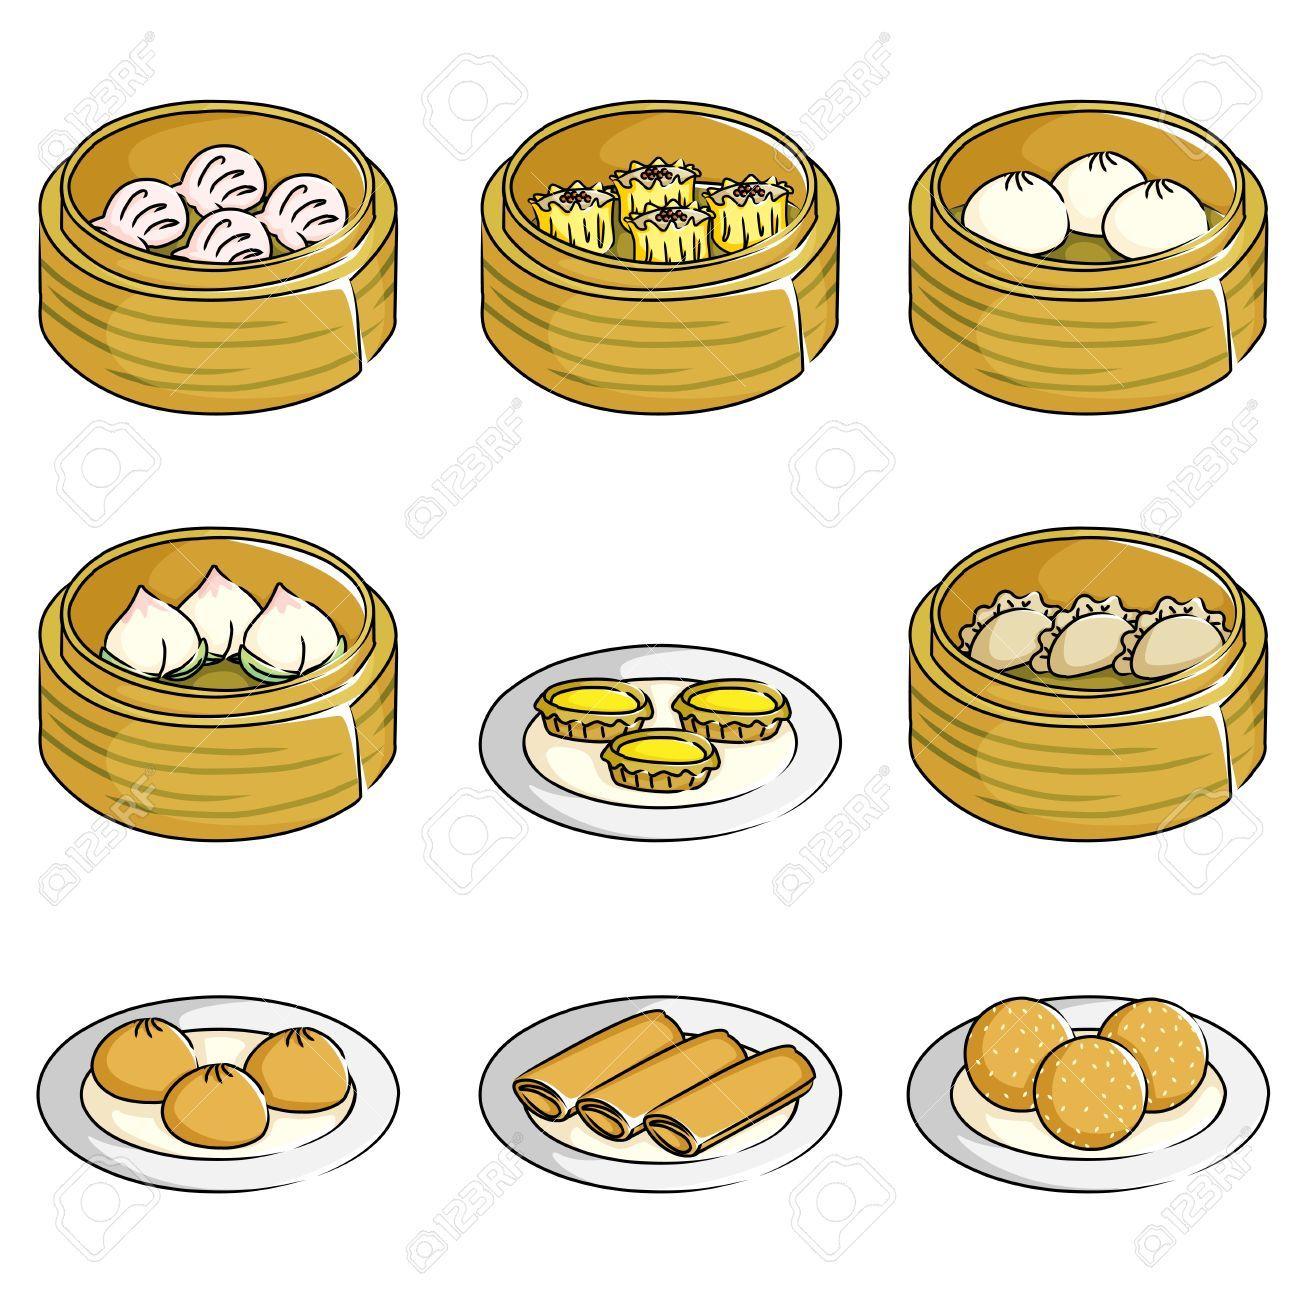 Image result for dimsum illustration Grafis, Stiker, Makanan